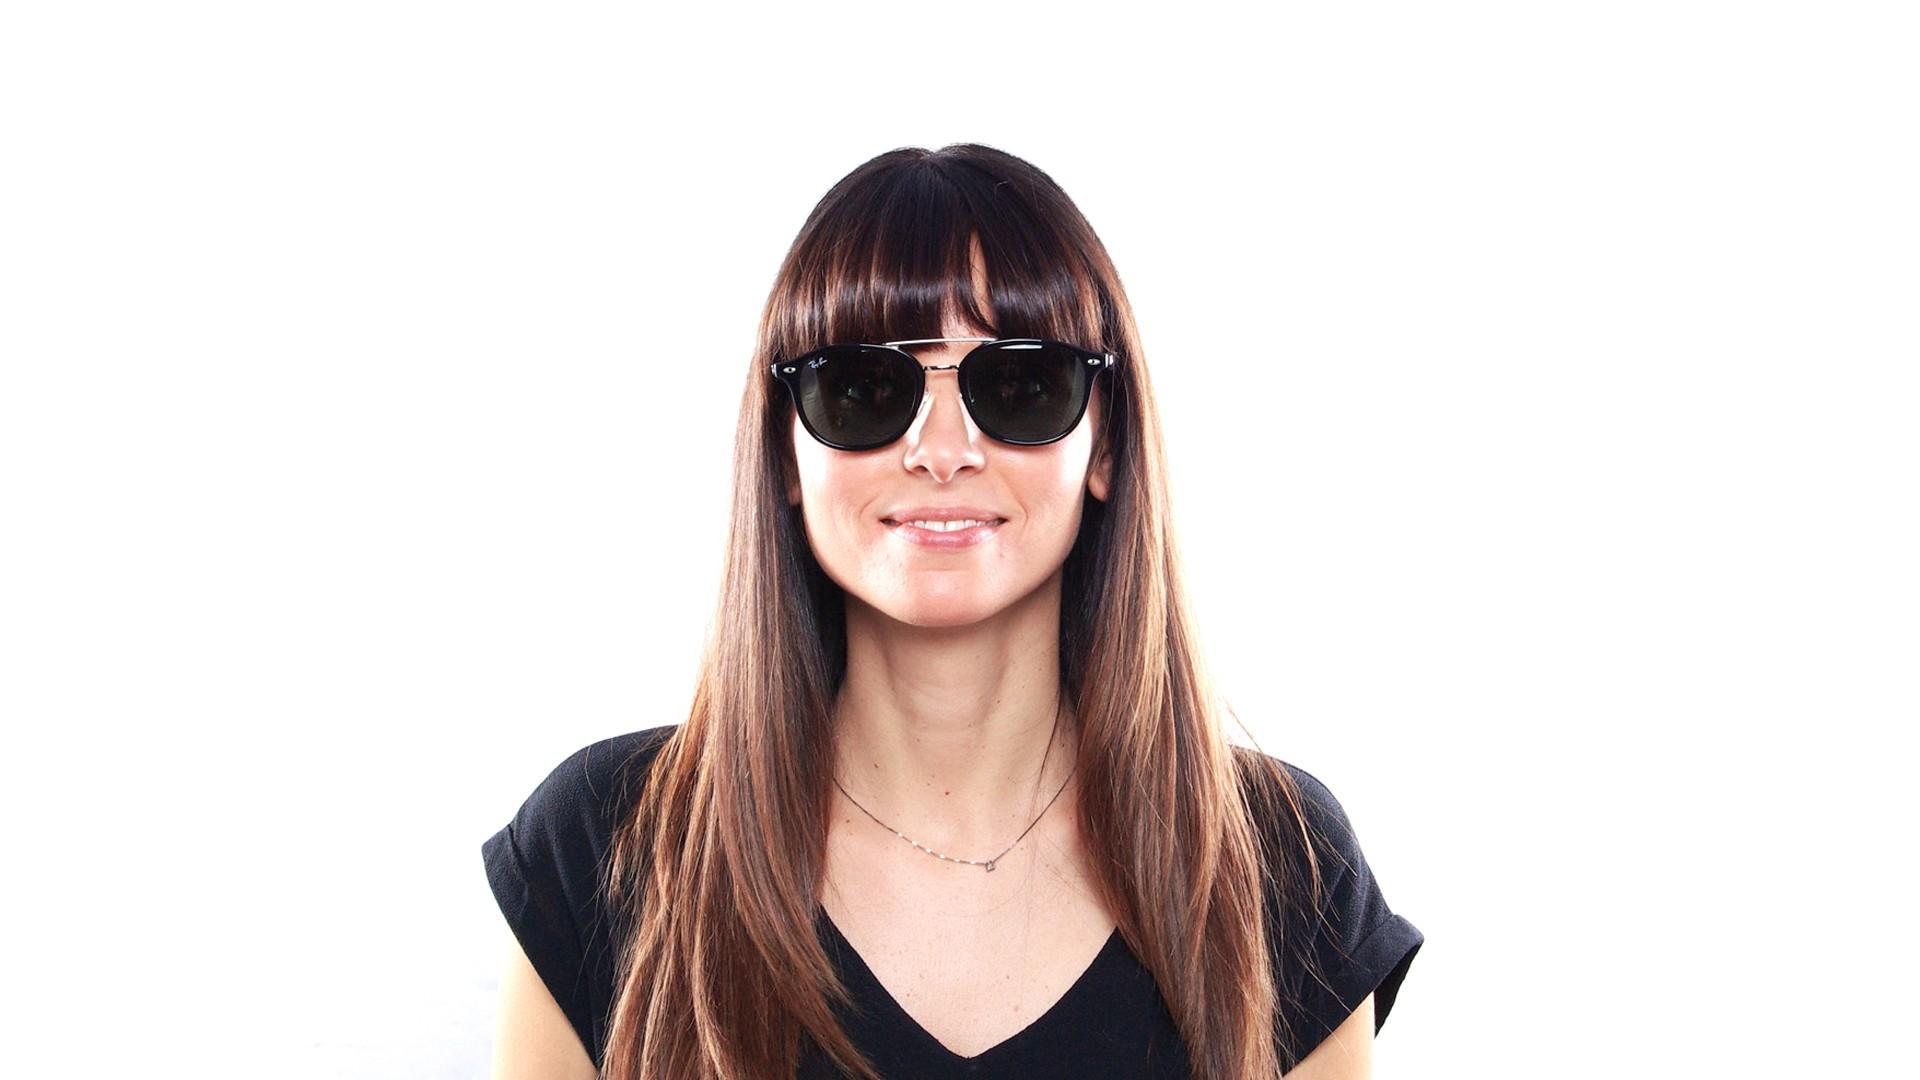 22a019303f0eb Sunglasses Ray-Ban Highstreet Black RB2183 901 71 53-21 Medium